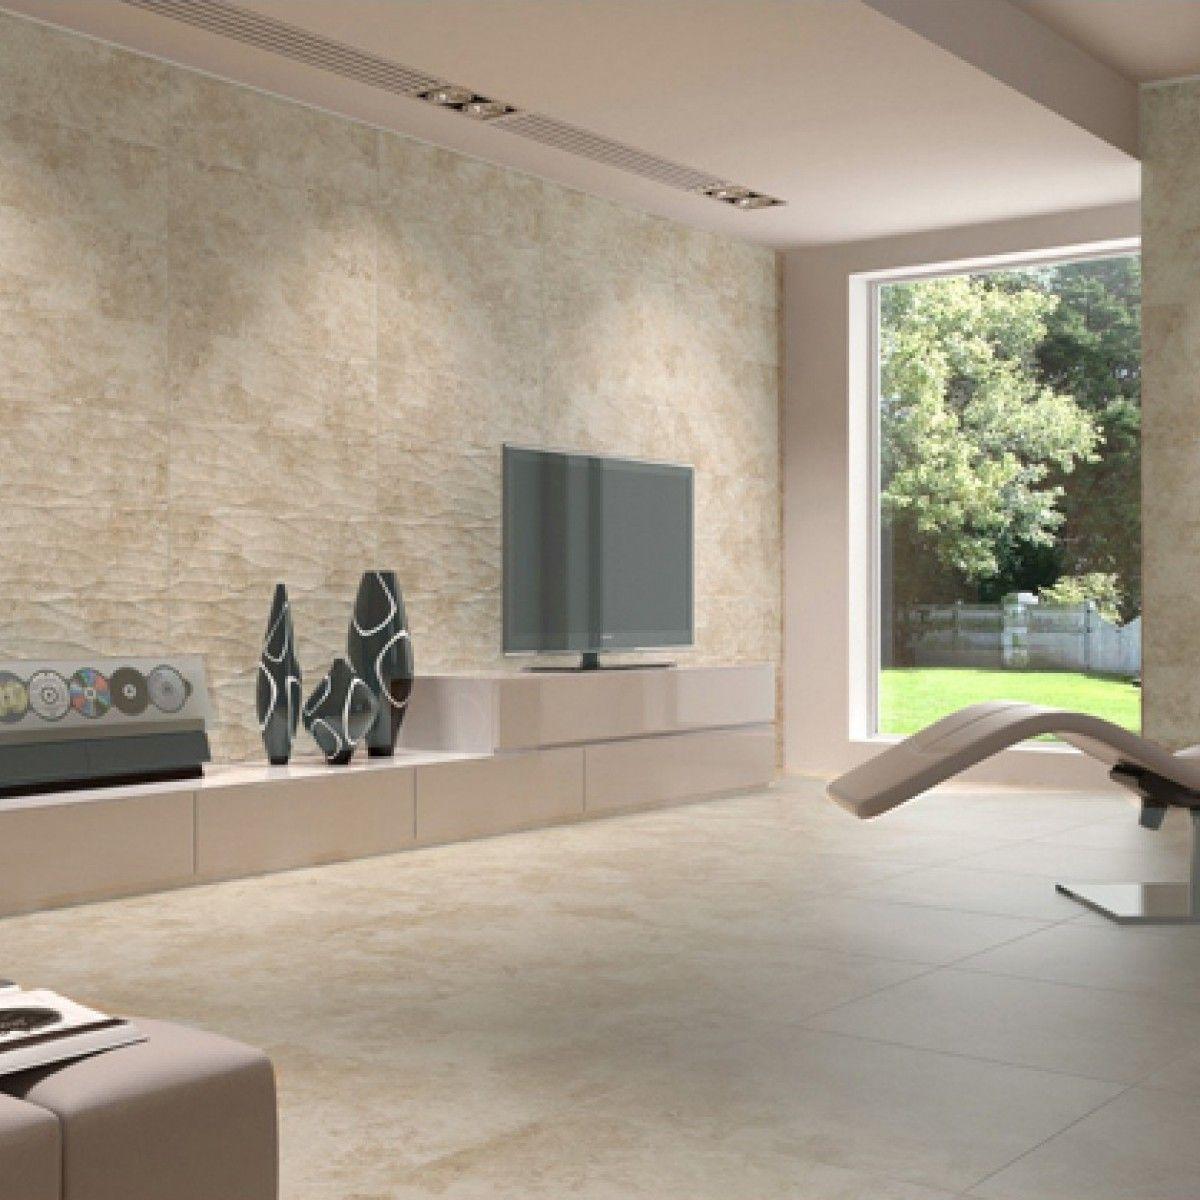 Tivoli marfil 450mm x 450mm floor tiles pinterest tiles tivoli marfil floor tile is a warm beige coloured ceramic floor tile dailygadgetfo Image collections